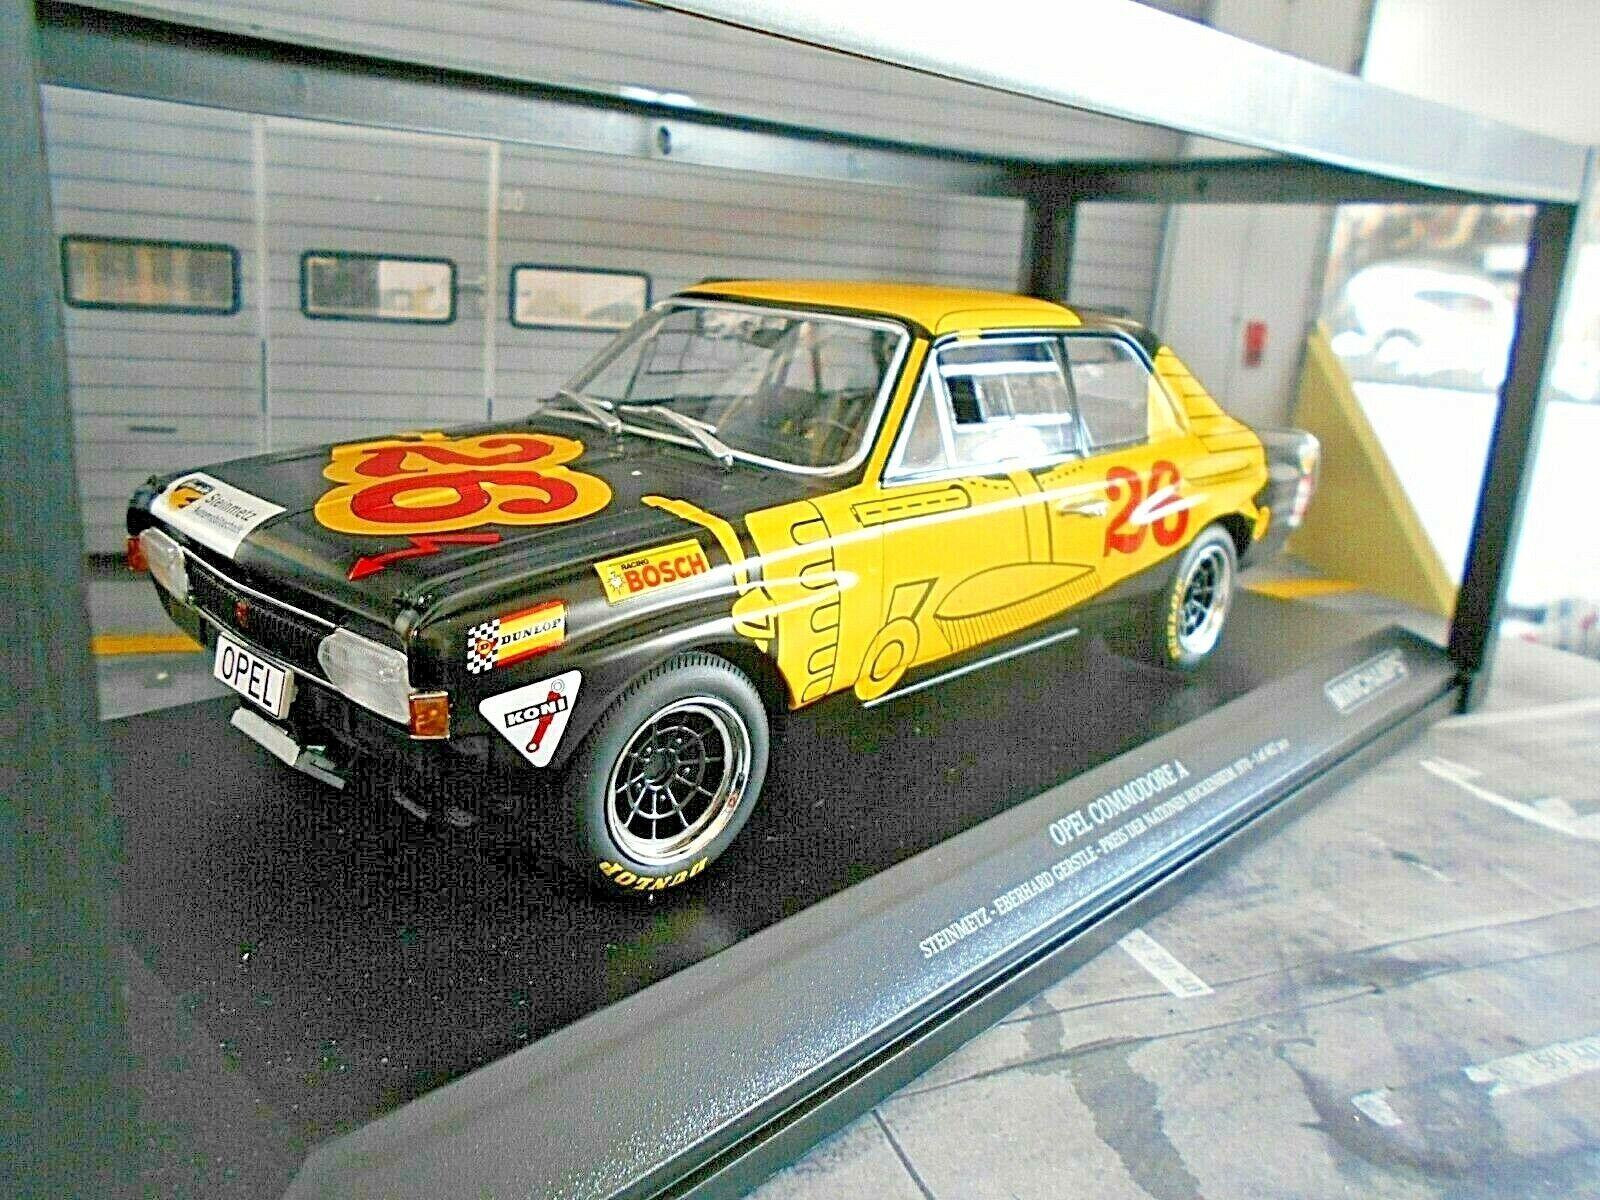 Opel Commodore a cantero racing hockeheim 1970 gerstle Minichamps 1 18